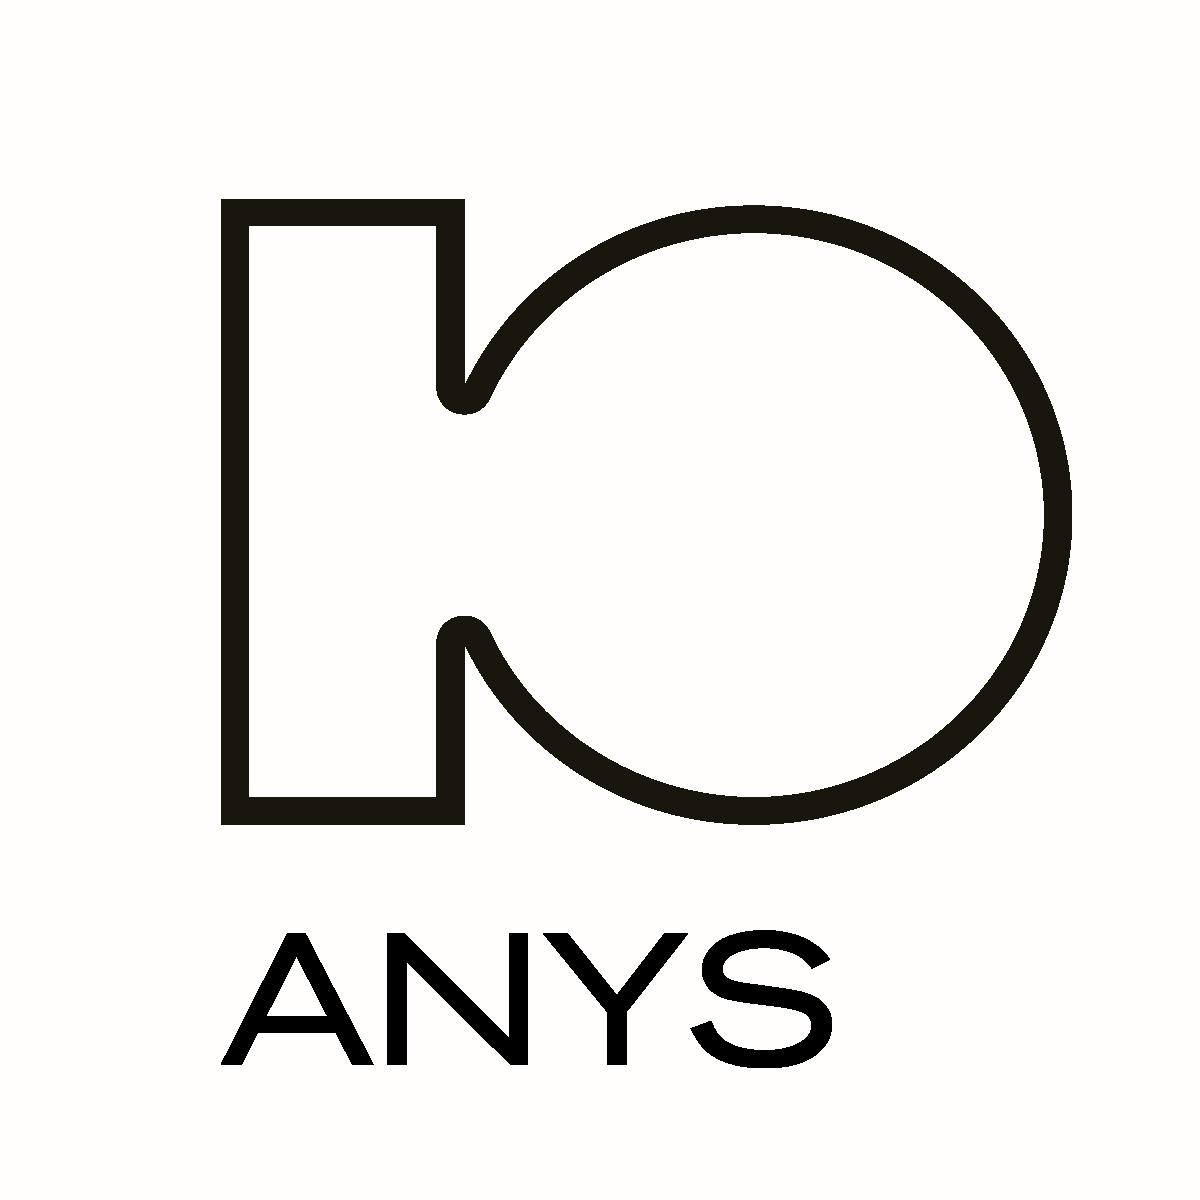 Logo 10 anys